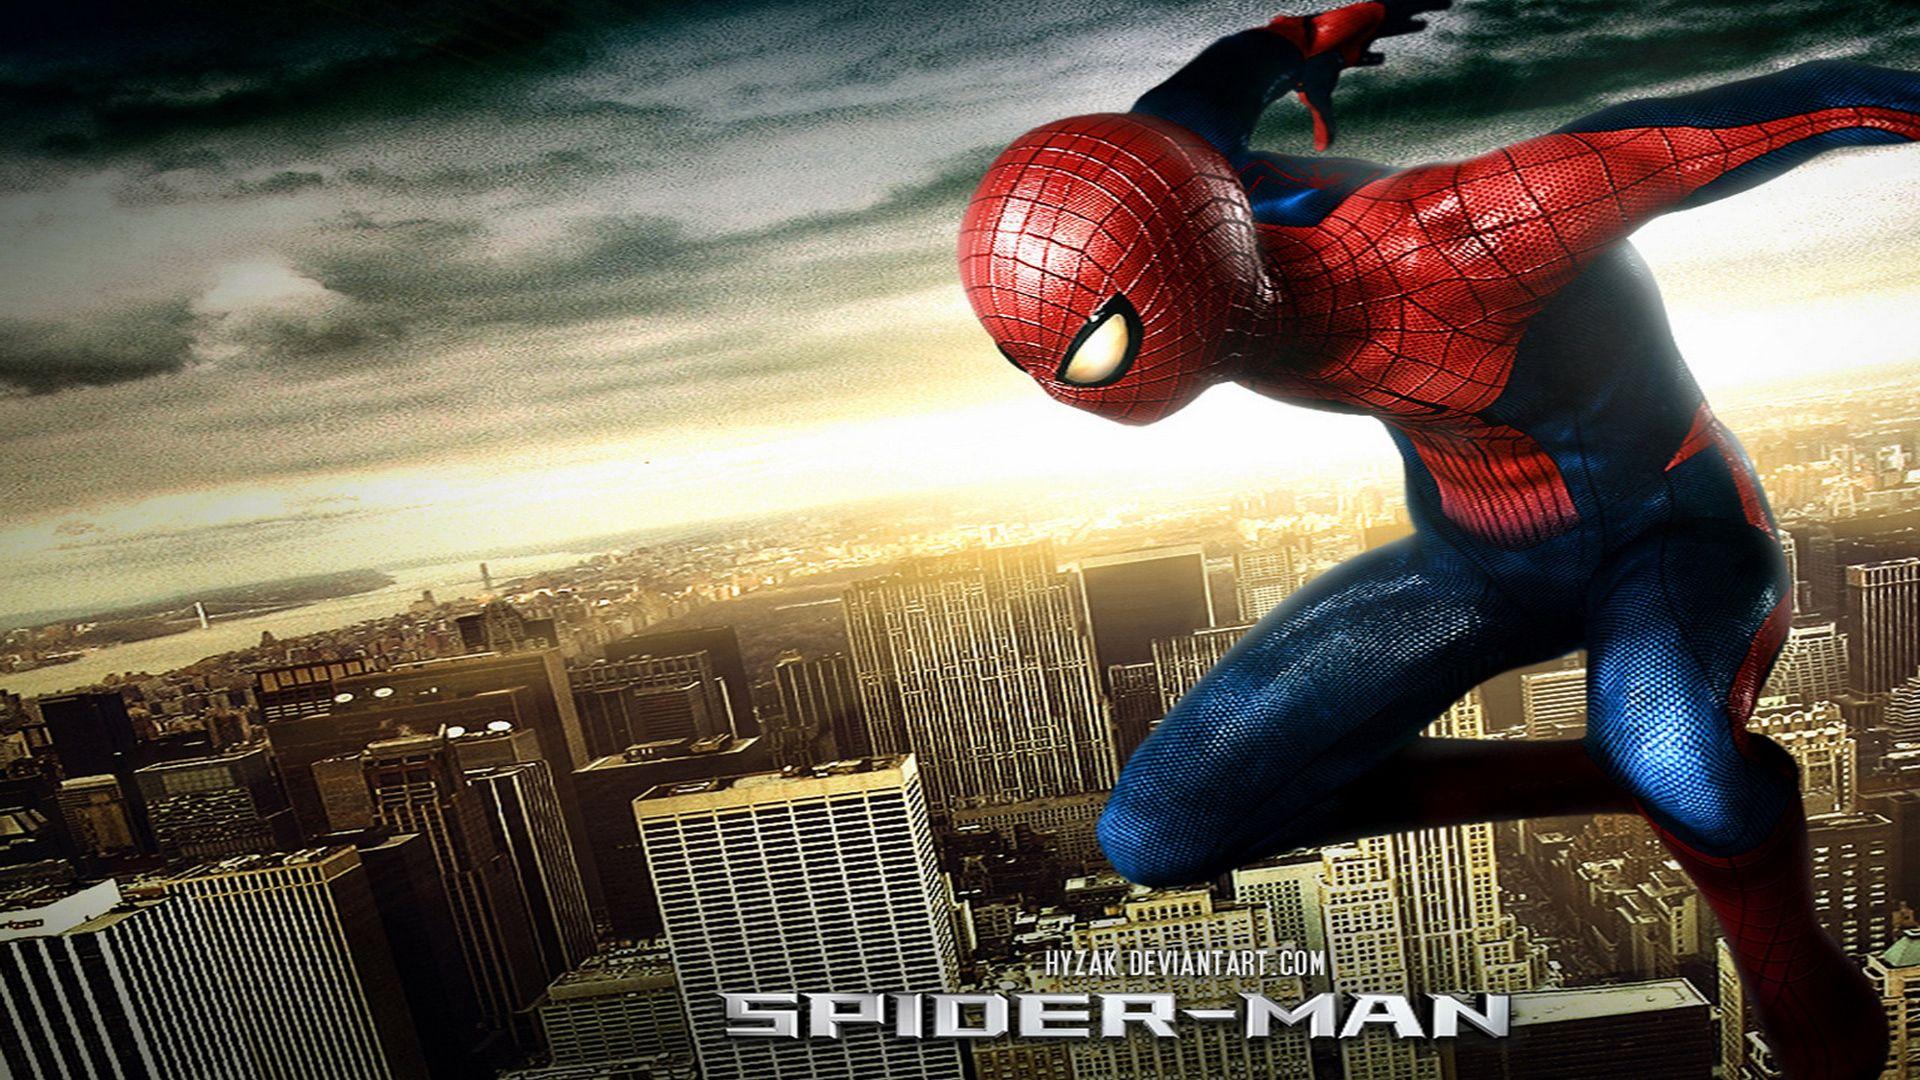 Spider Man Pictures